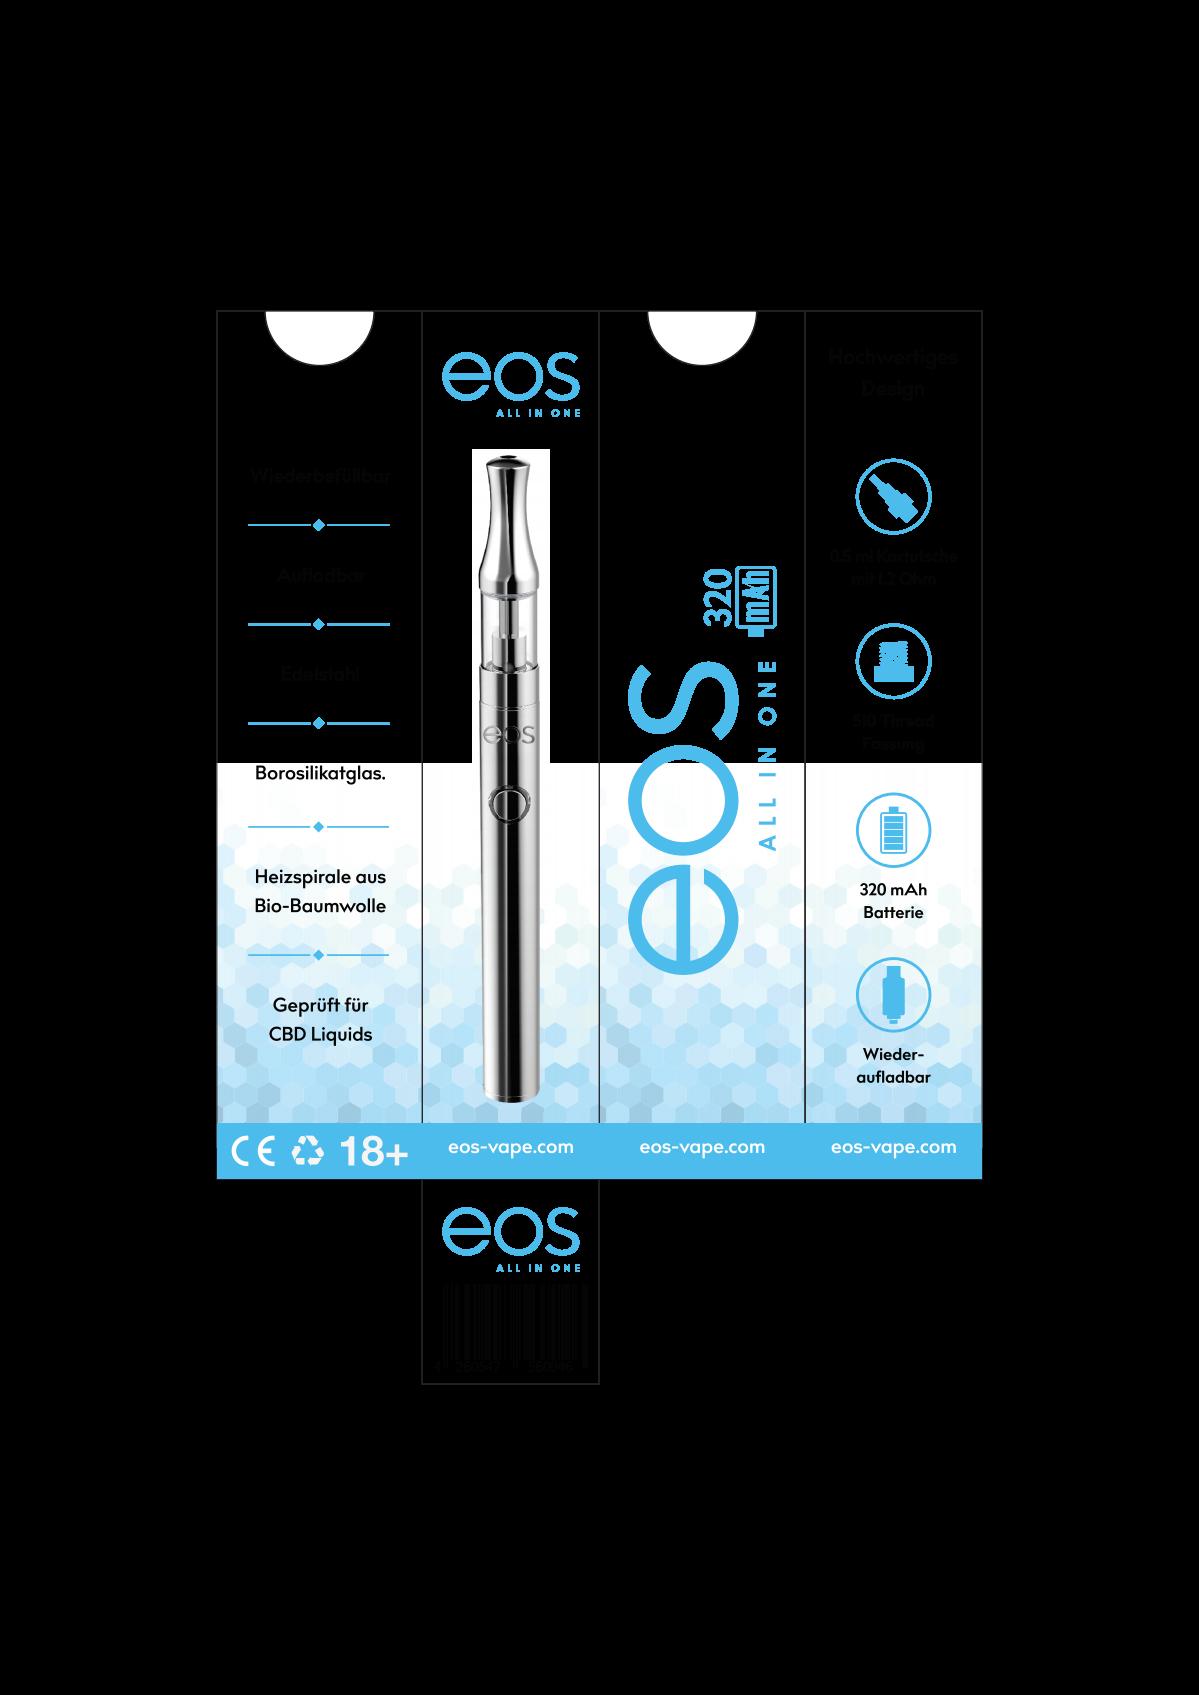 eos Vape pen and cartrdige Packaging